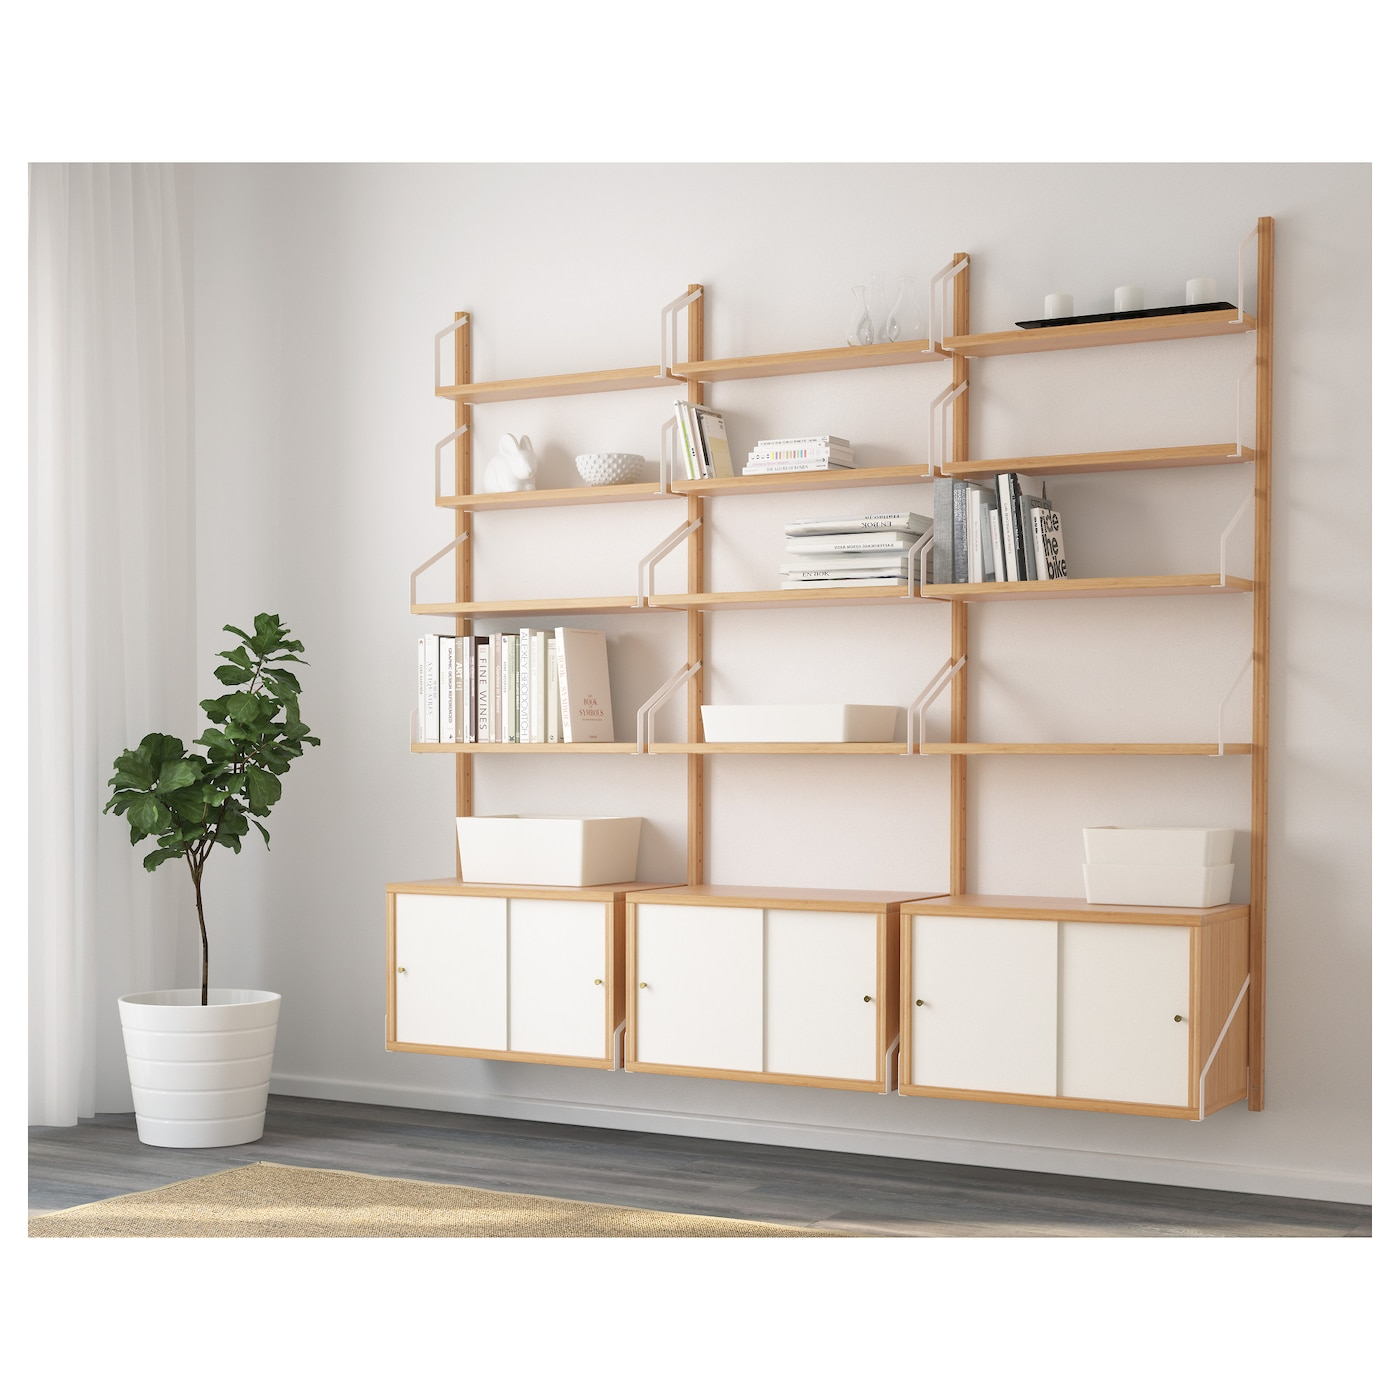 Svaln s estanter as modulares bamb blanco 193 x 35 x 176 - Ikea muebles modulares ...